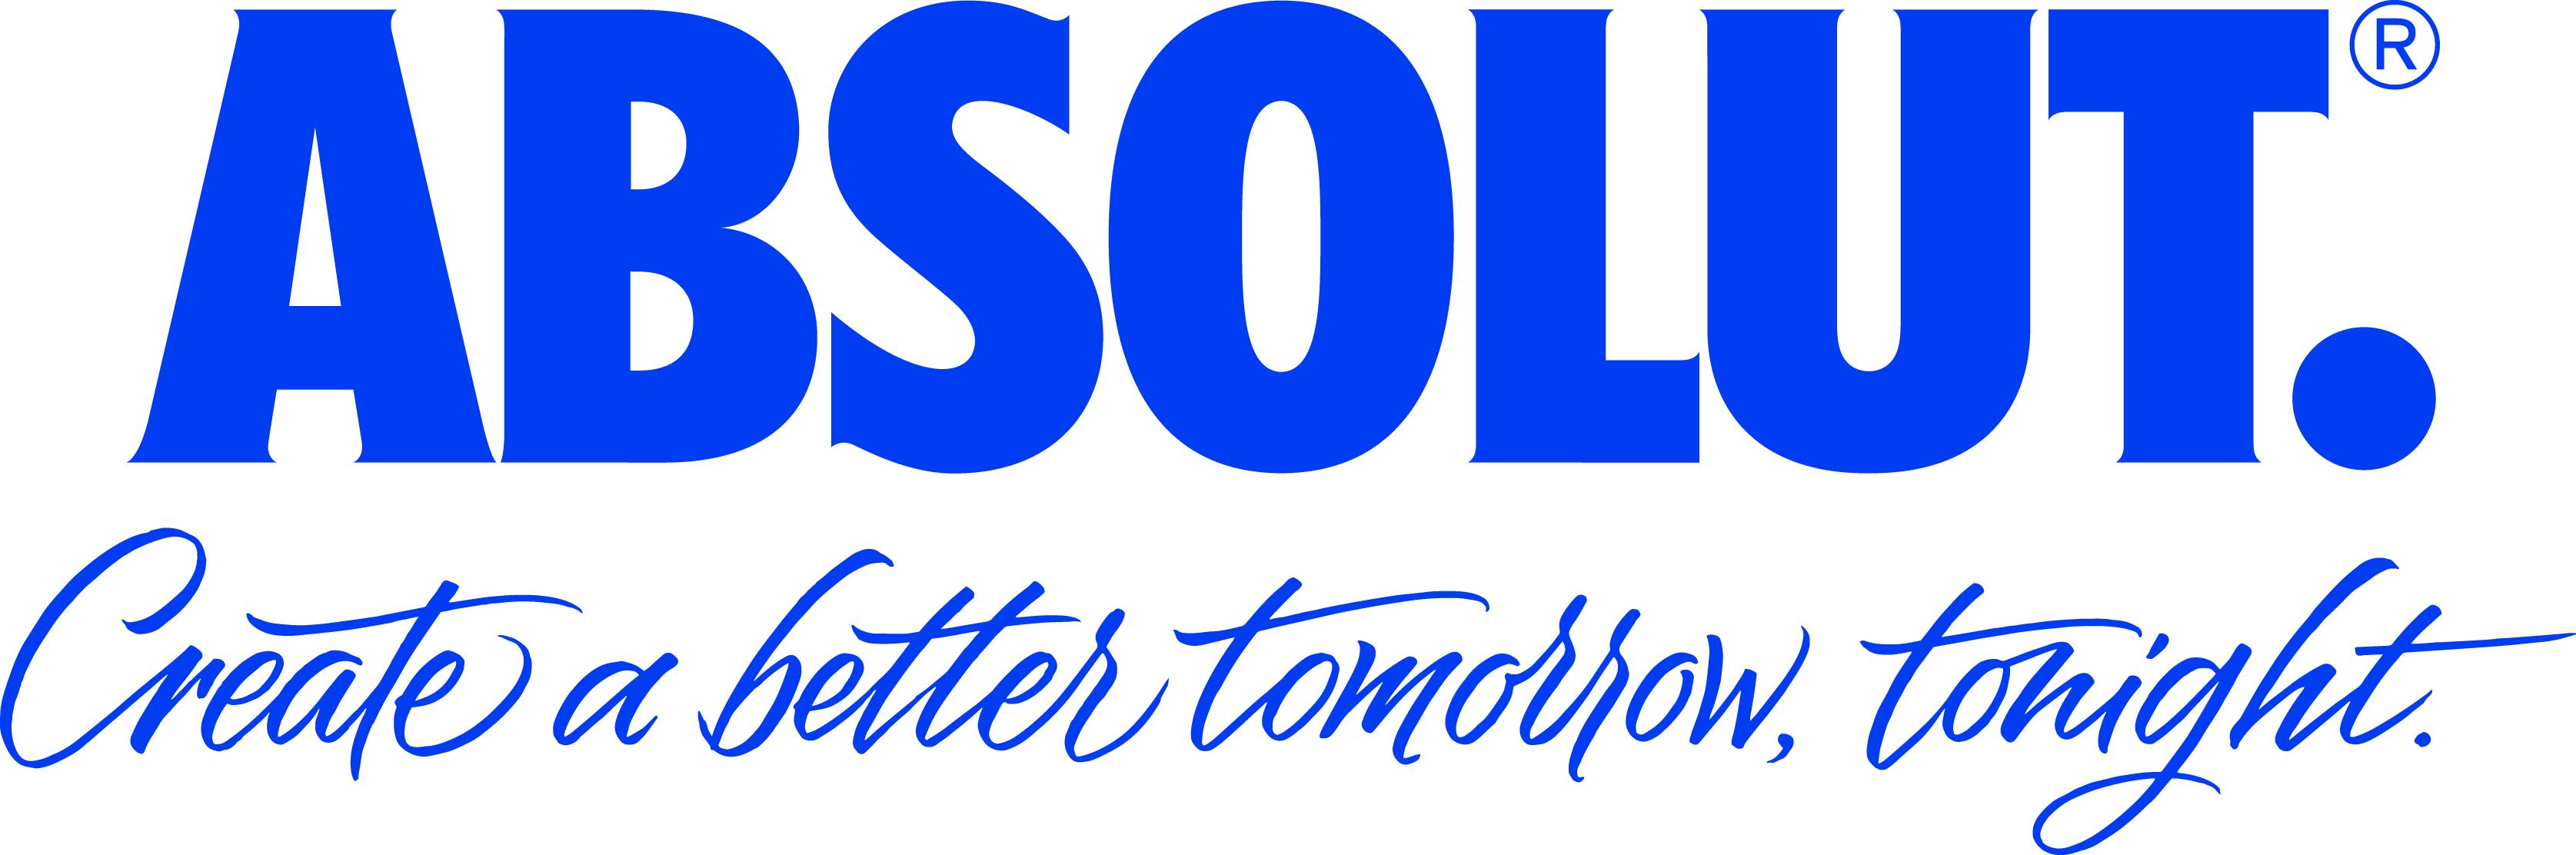 ABSOLUT_BetterTomorrow_logo (1)-01.jpg